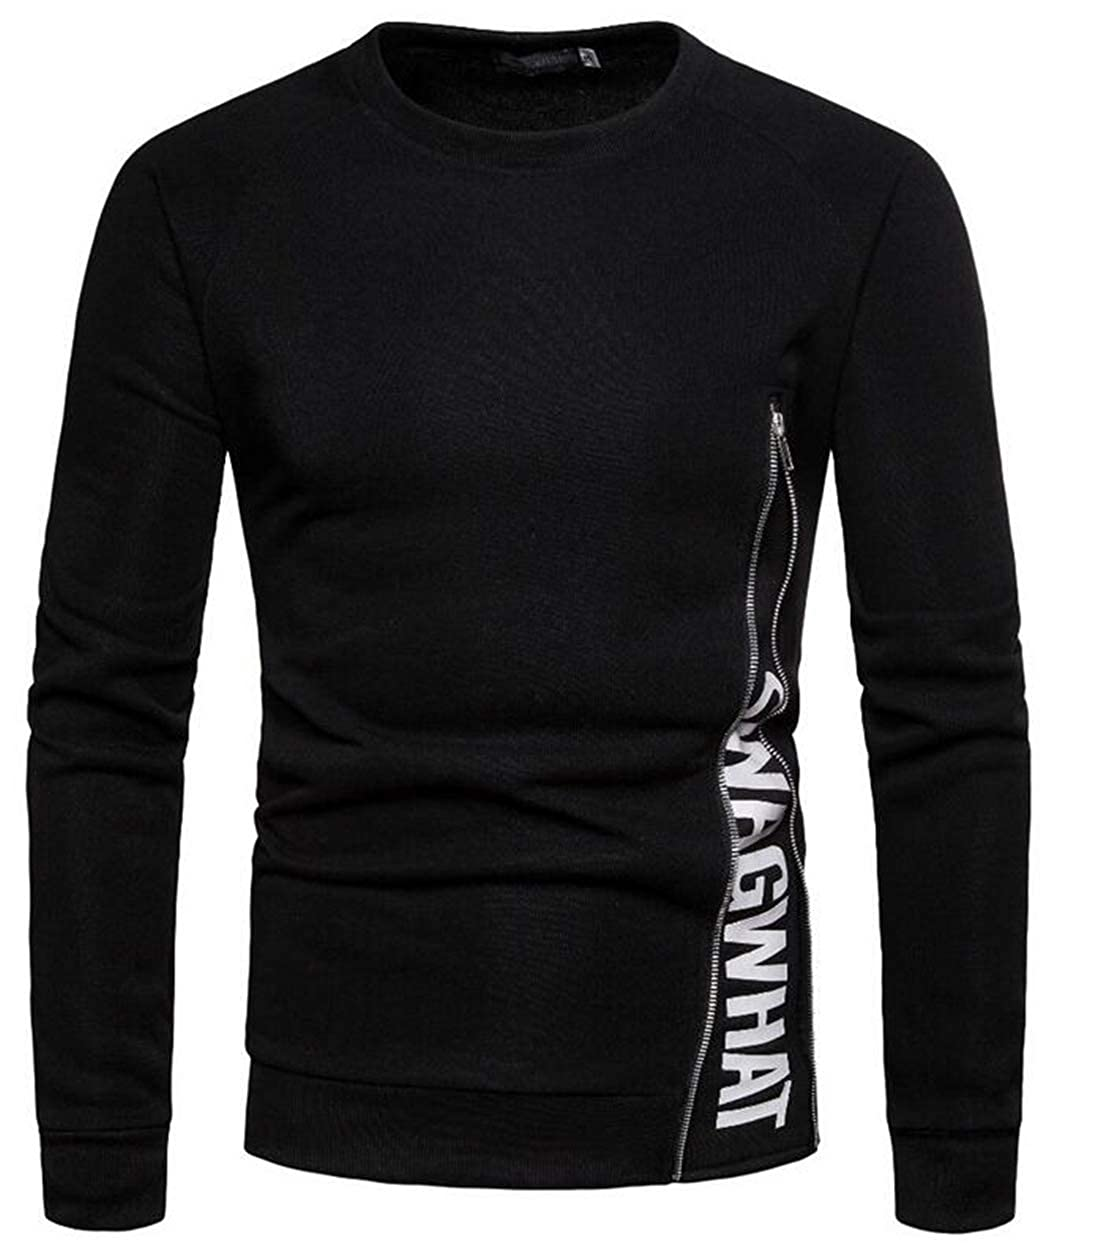 Rrive Mens Stylish Patchwork Camo Flap Pockets Raglan Sleeve Round Neck Pullover Sweatshirt